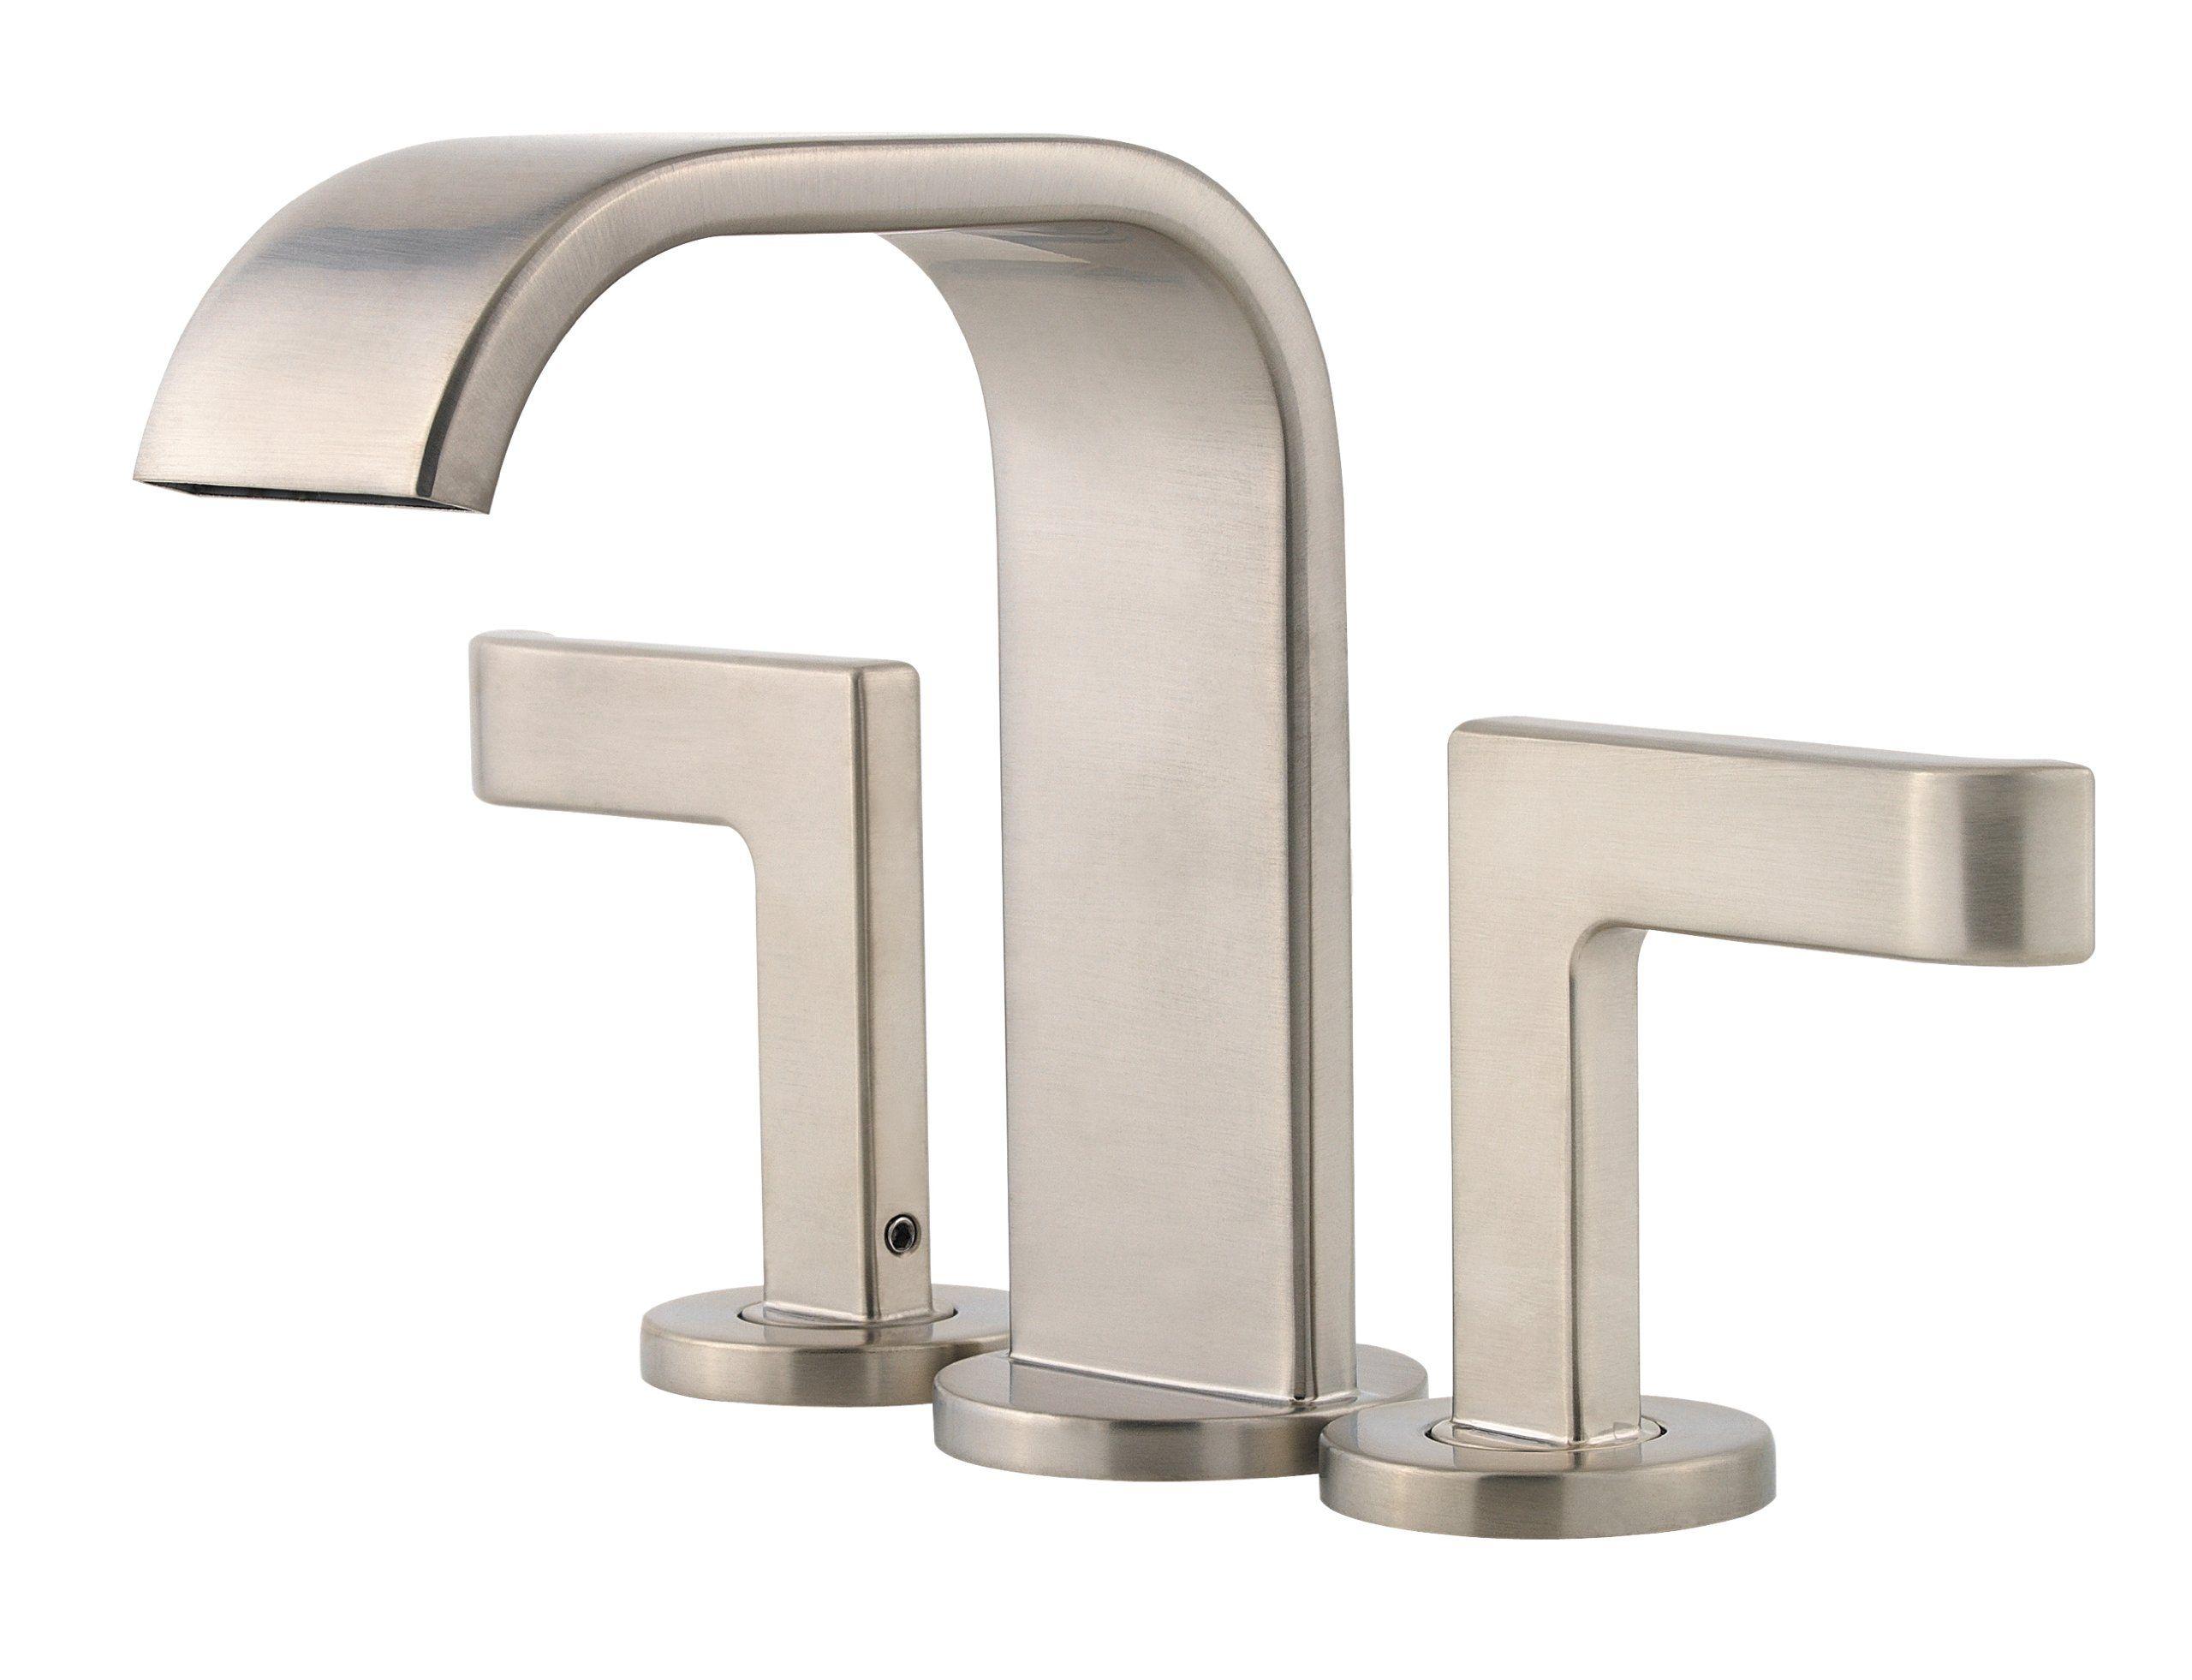 Pfister Skye 2 Handle Mini Widespread Bathroom Faucet, Brushed Nickel